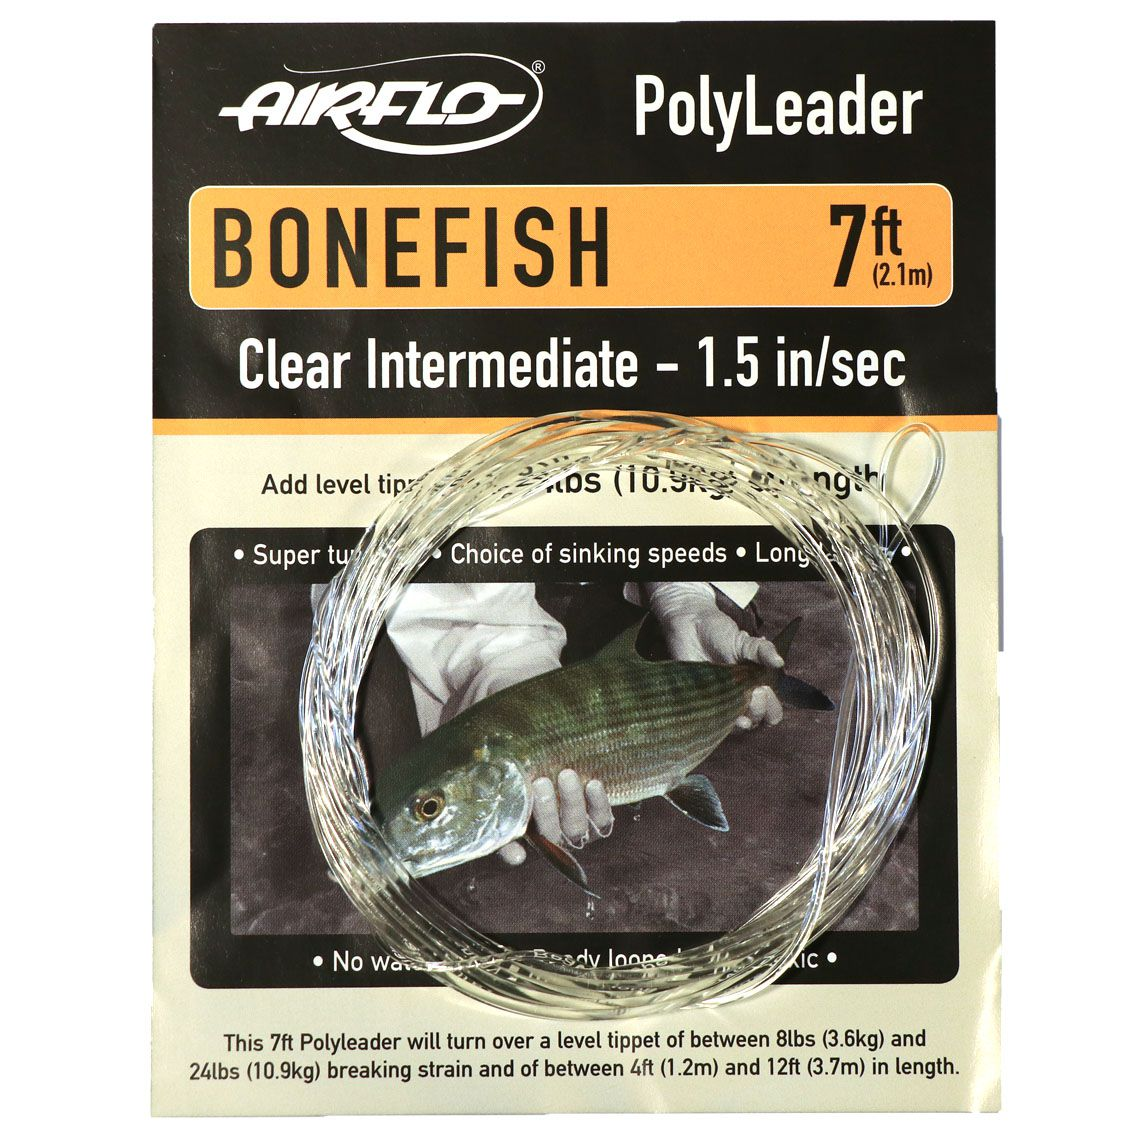 Leader Airflo Bonefish Polyleader Clear Intermediate 7'